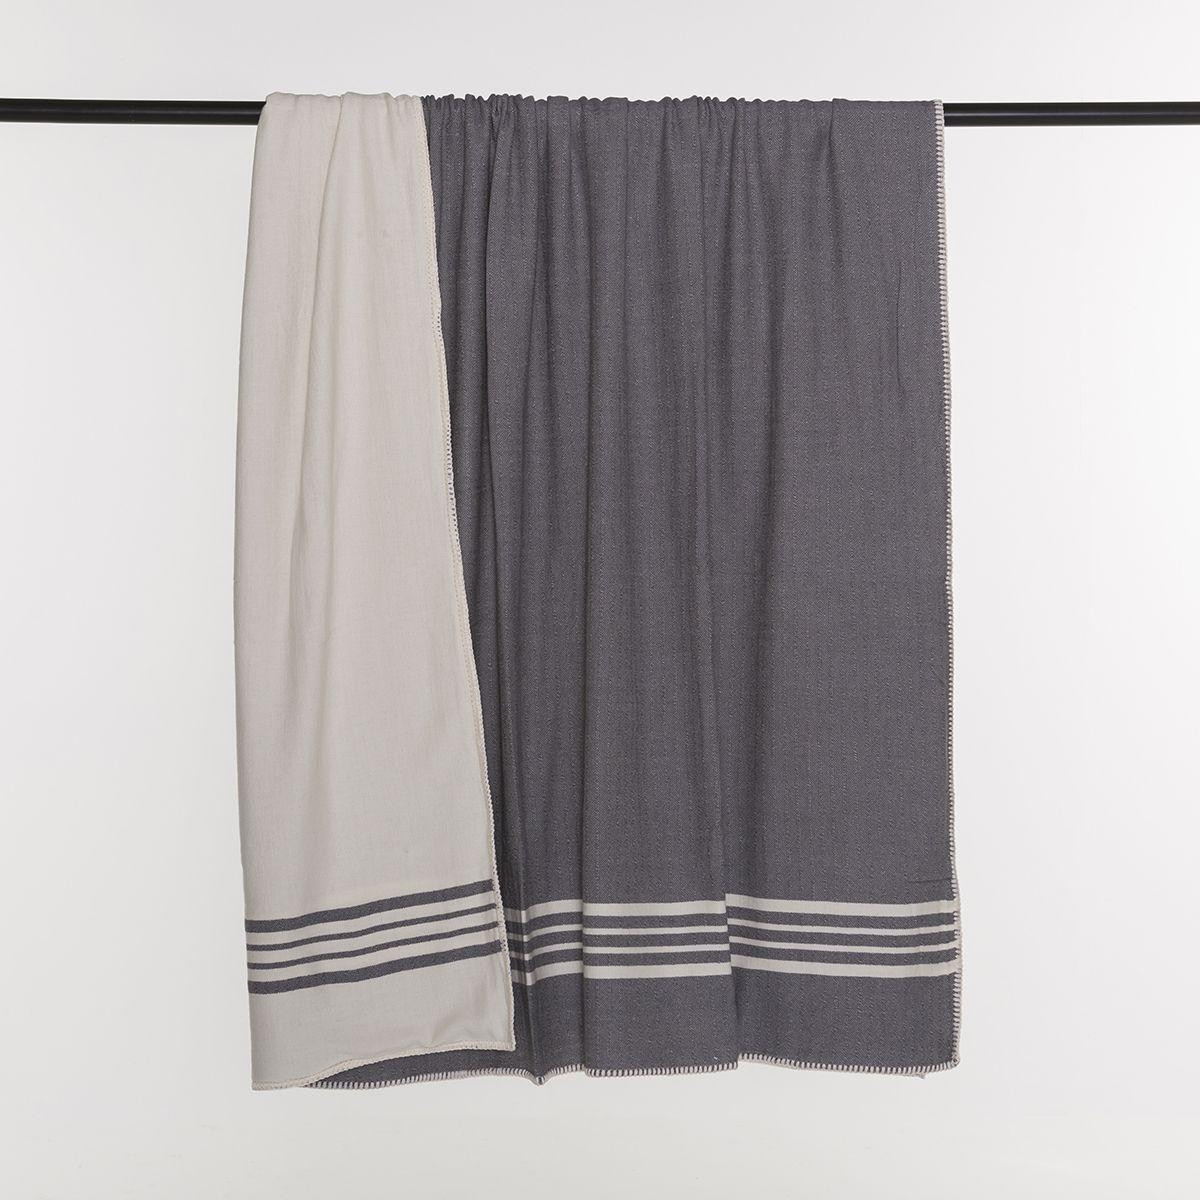 Throw Sultan / Double Side - Dark Grey